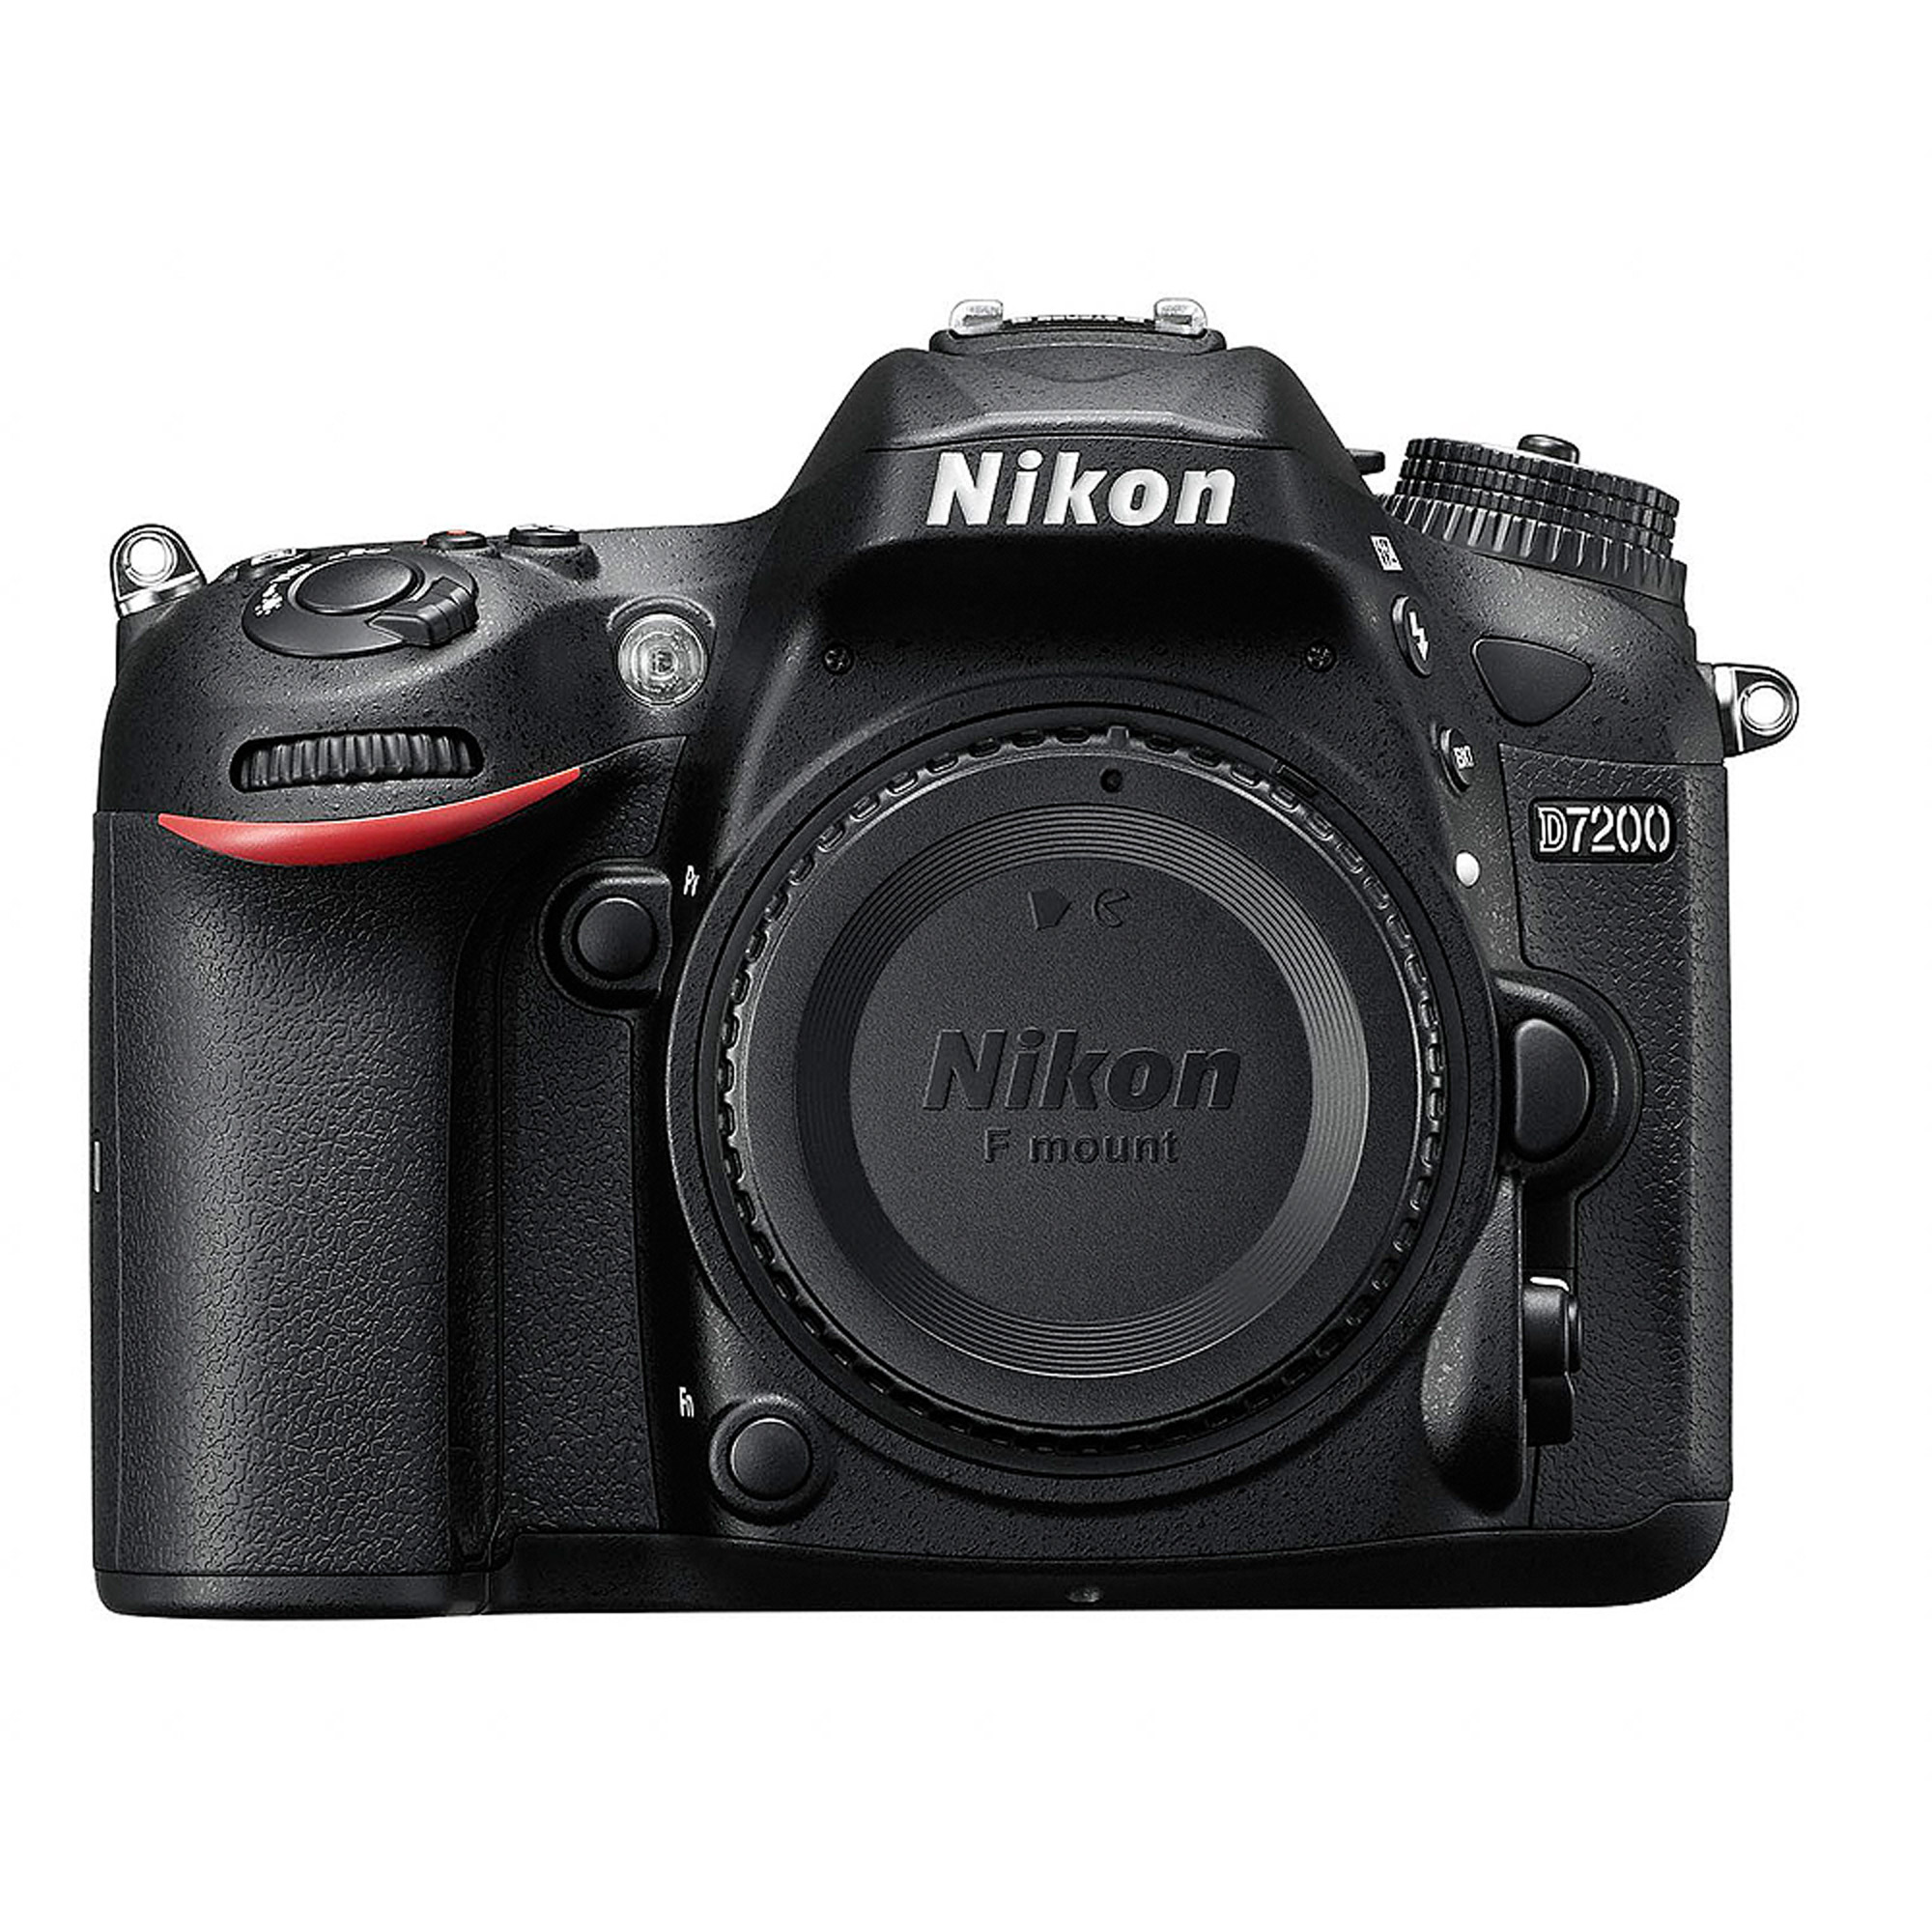 Nikon Black D7200 DX Digital SLR Camera with 24.2 Megapixels (Body Only) by Nikon